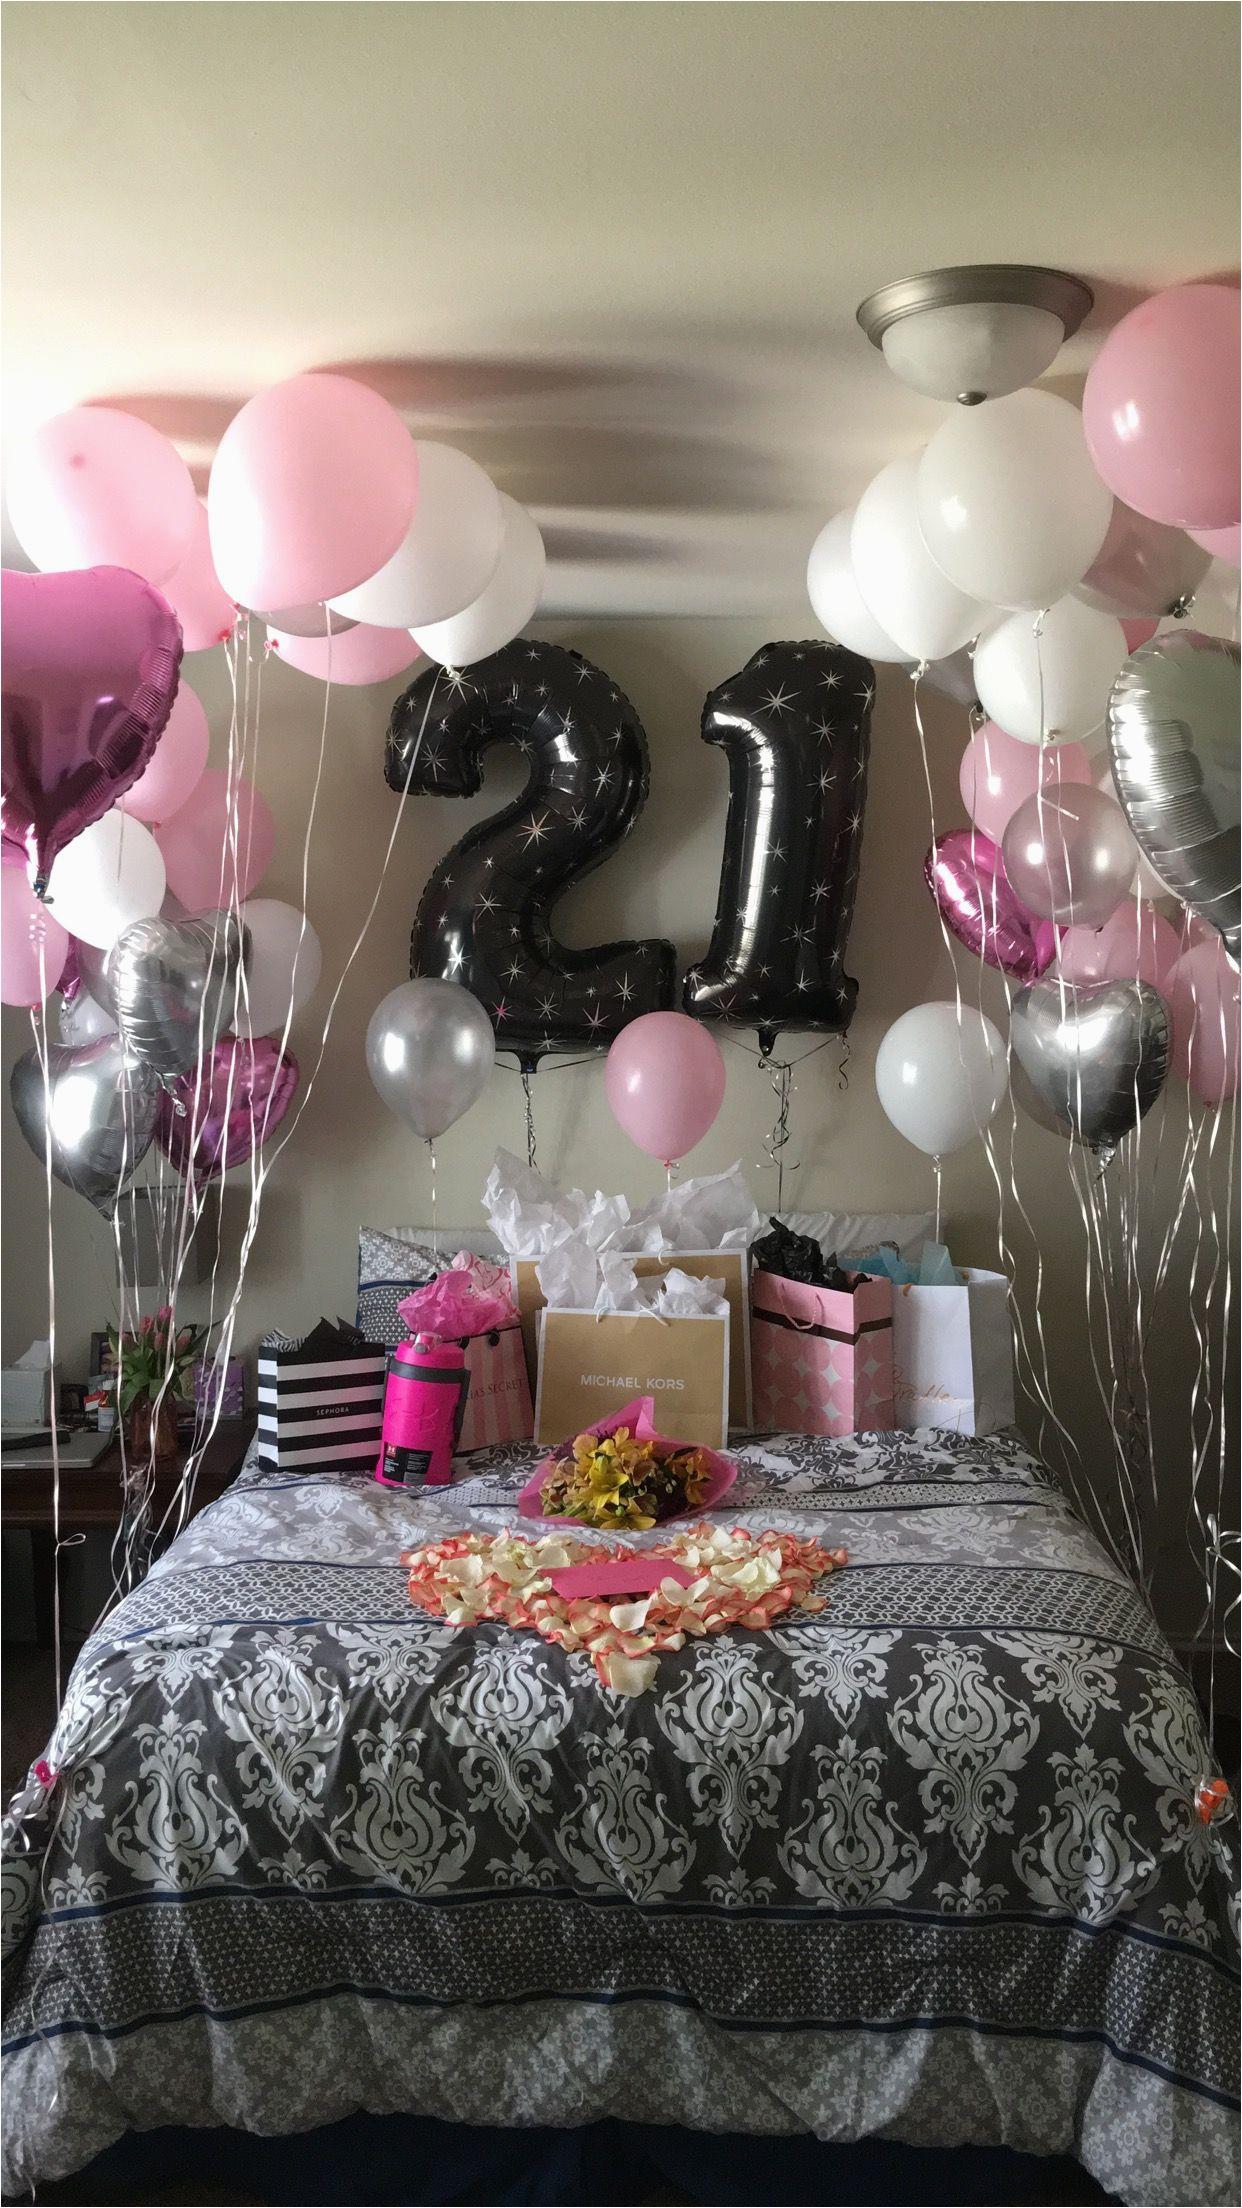 Surprise Birthday Gift Ideas For Her 21st Girlfriends Pinterest